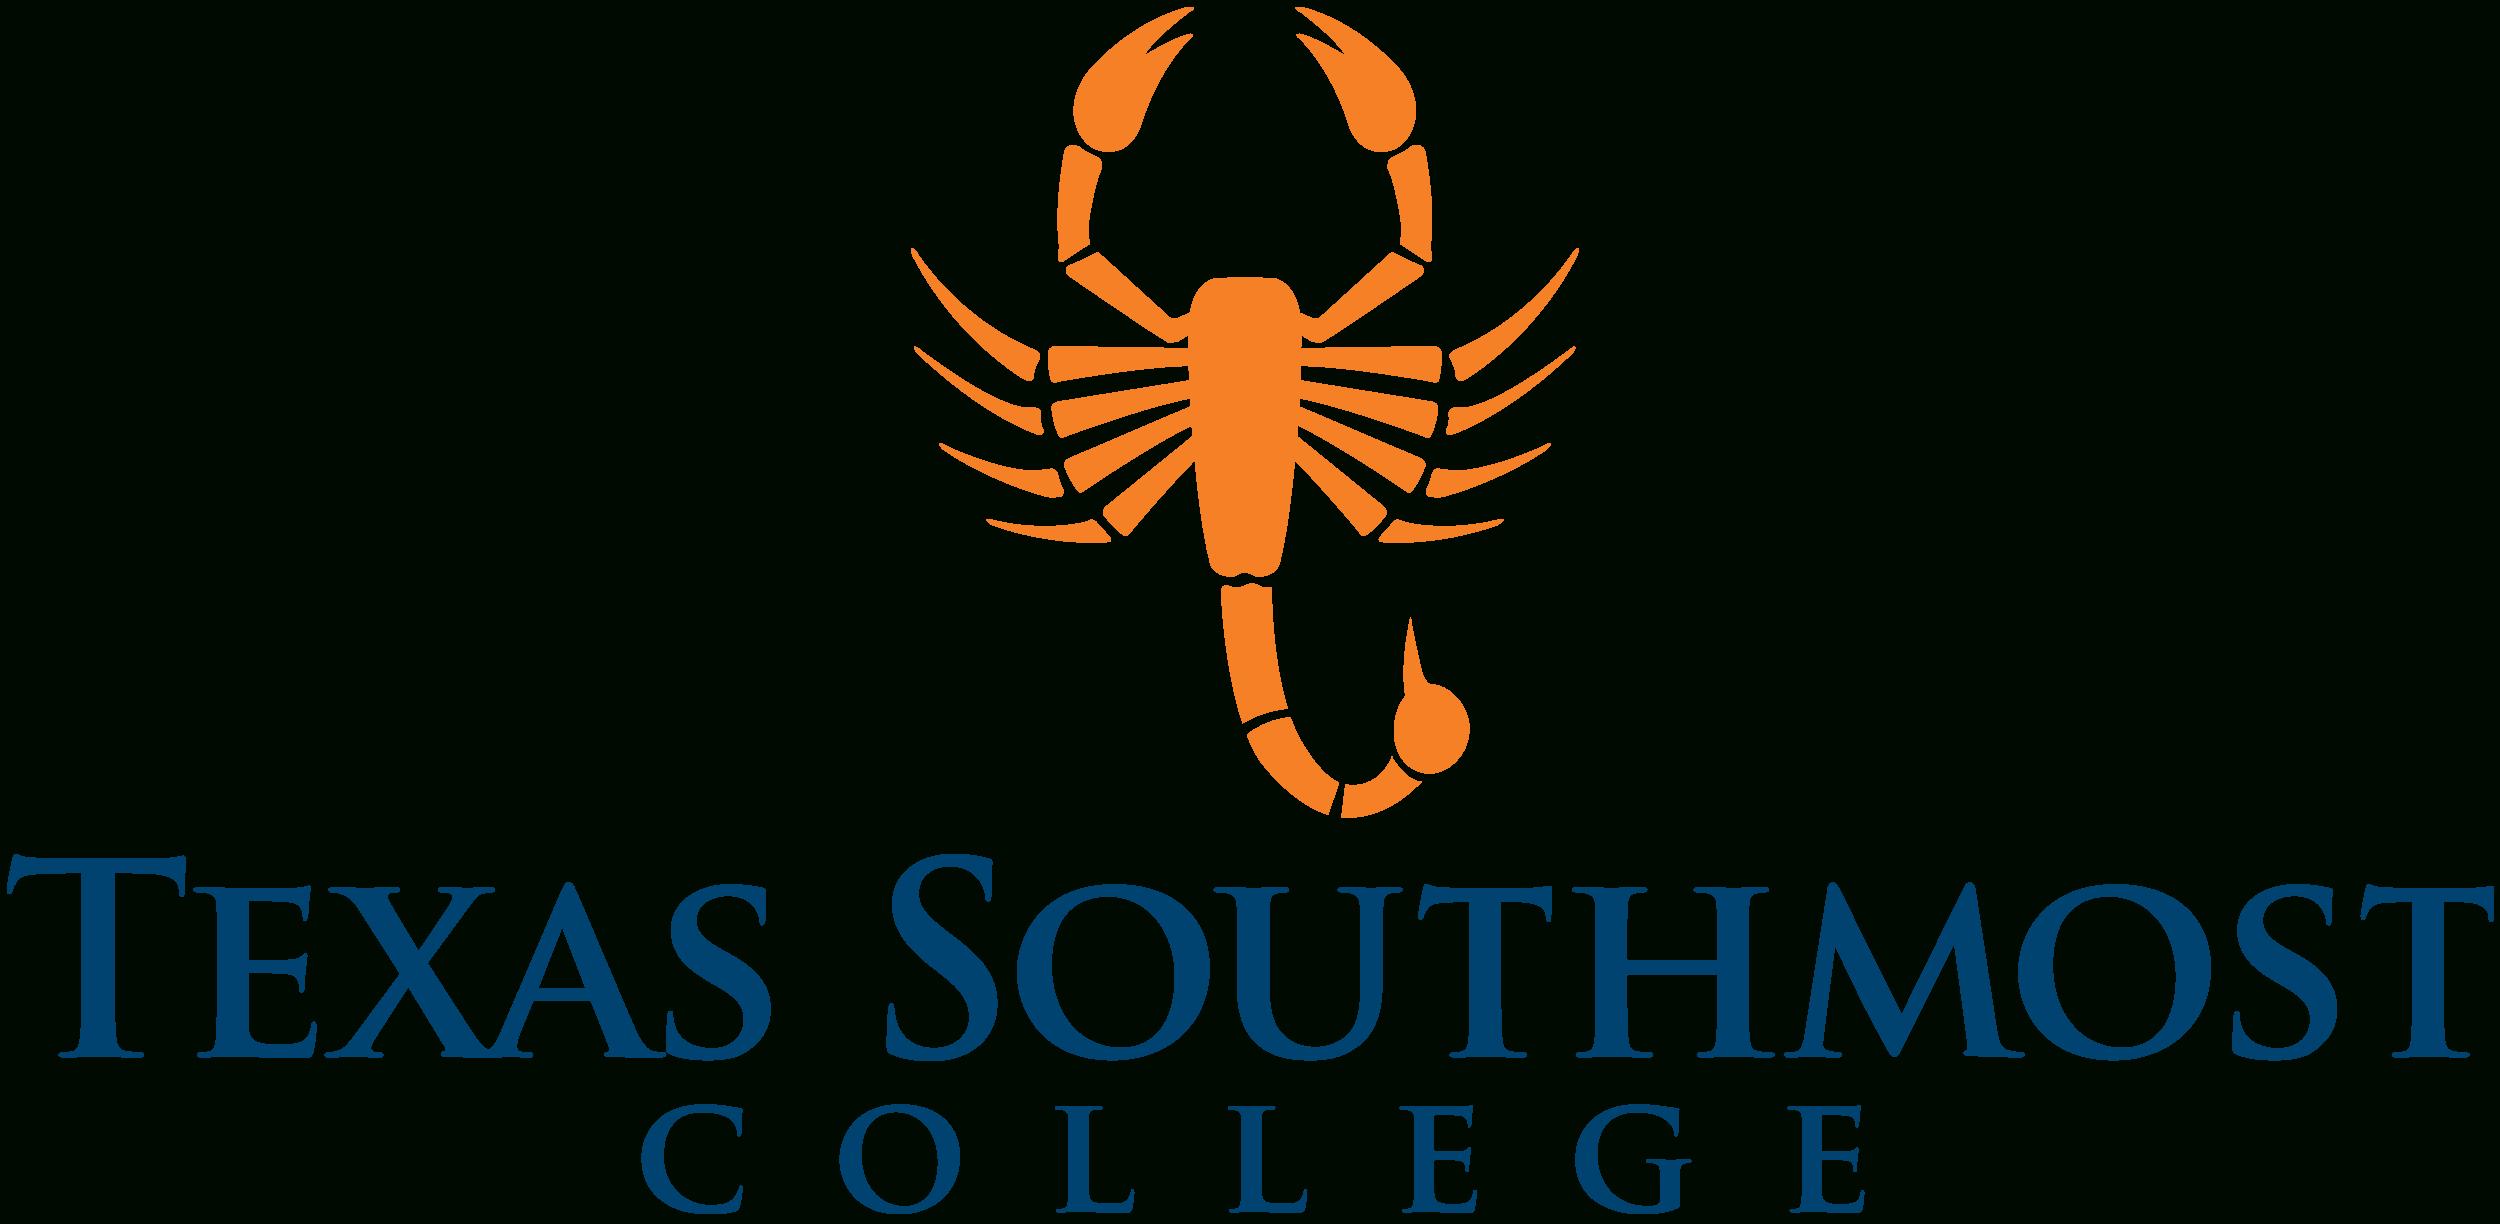 Logos - Texas Southmost College Map